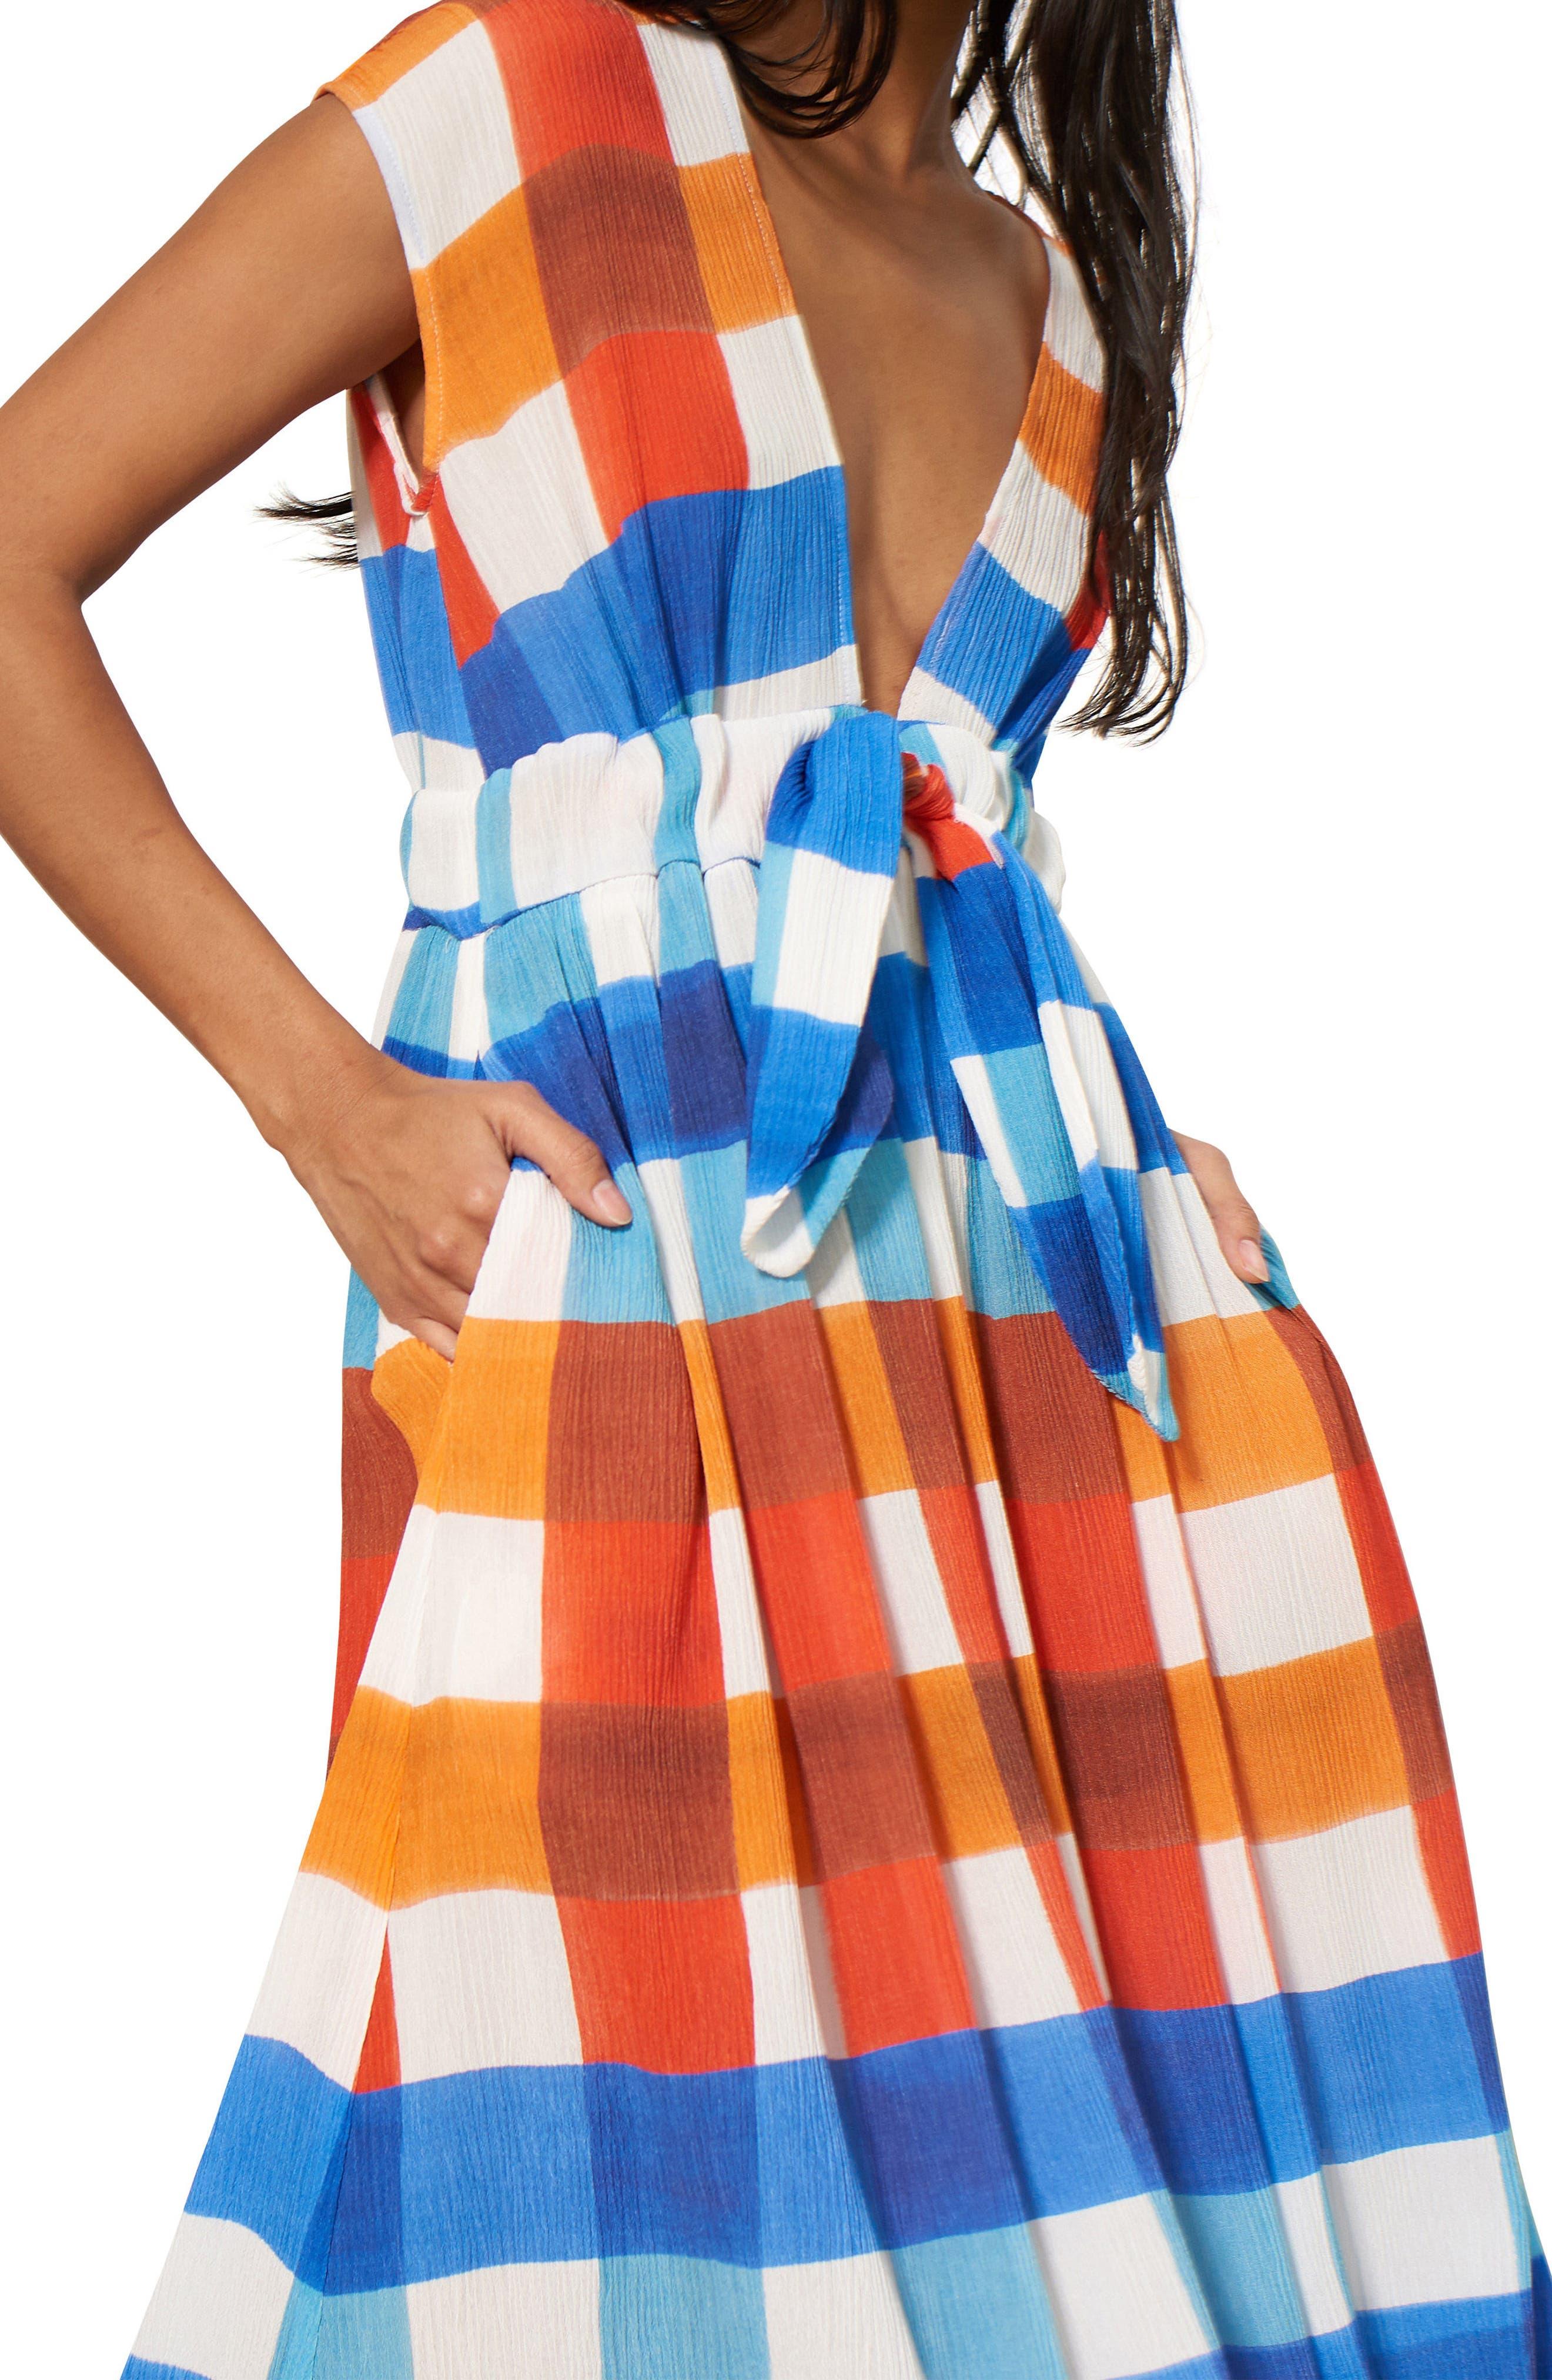 Katinka Check Cover-Up Maxi Dress,                             Alternate thumbnail 3, color,                             RED/ BLUE MULTI